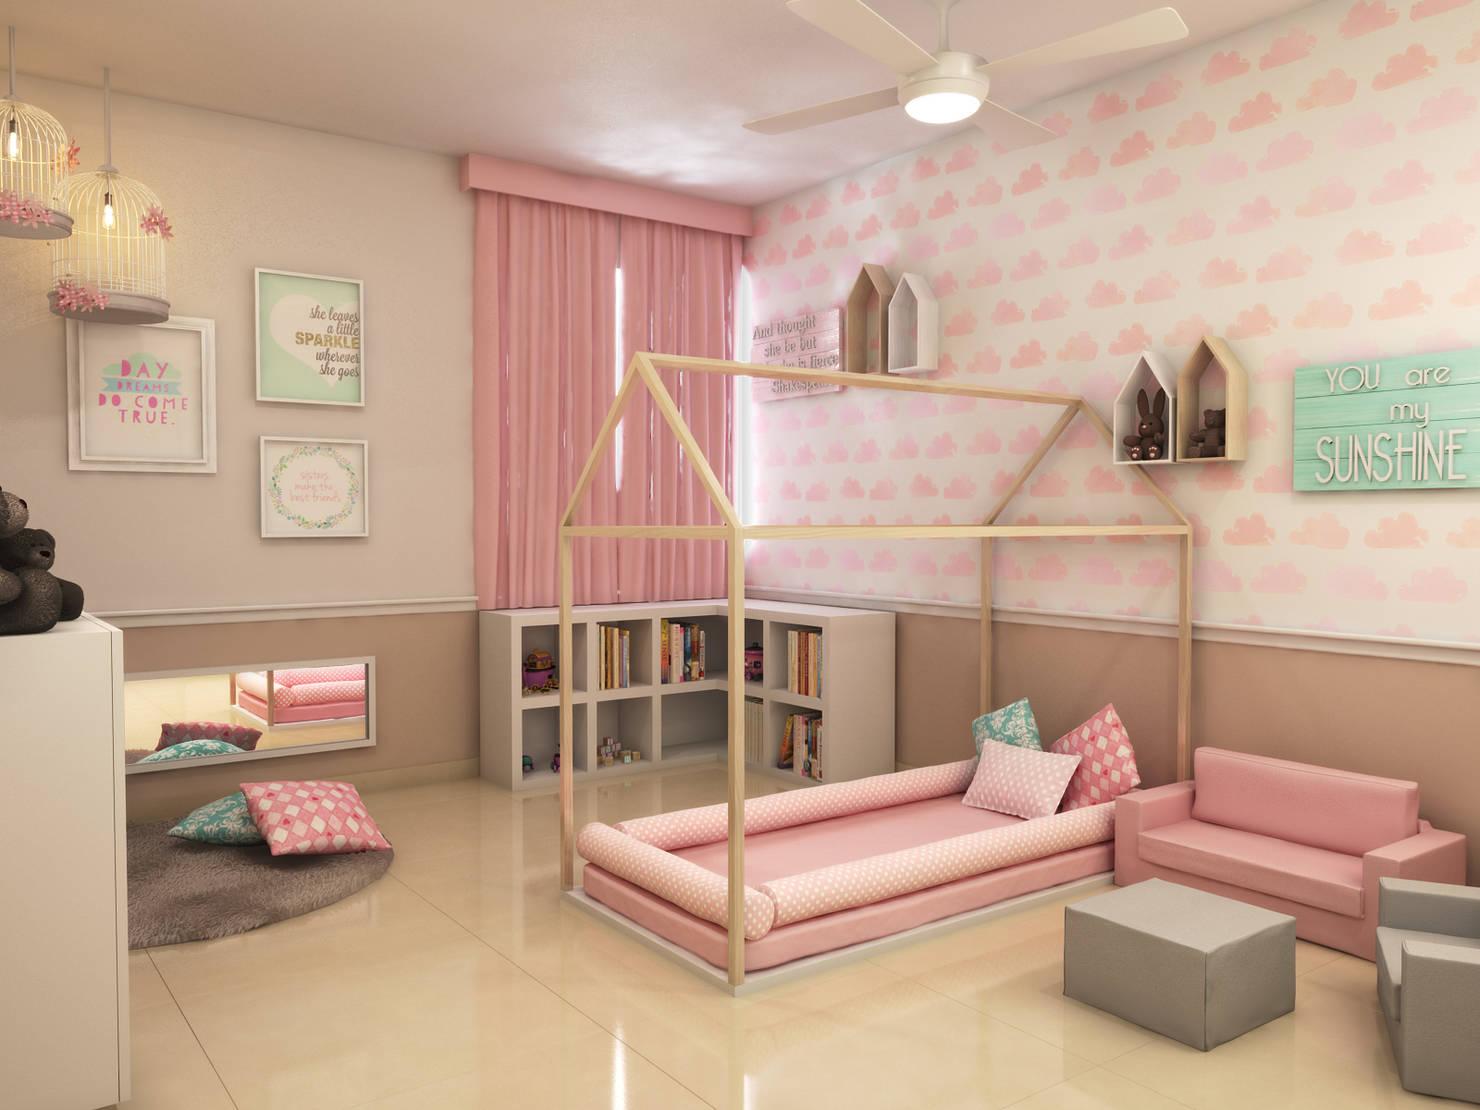 Dormitorios para niñas: ideas para decorarlo